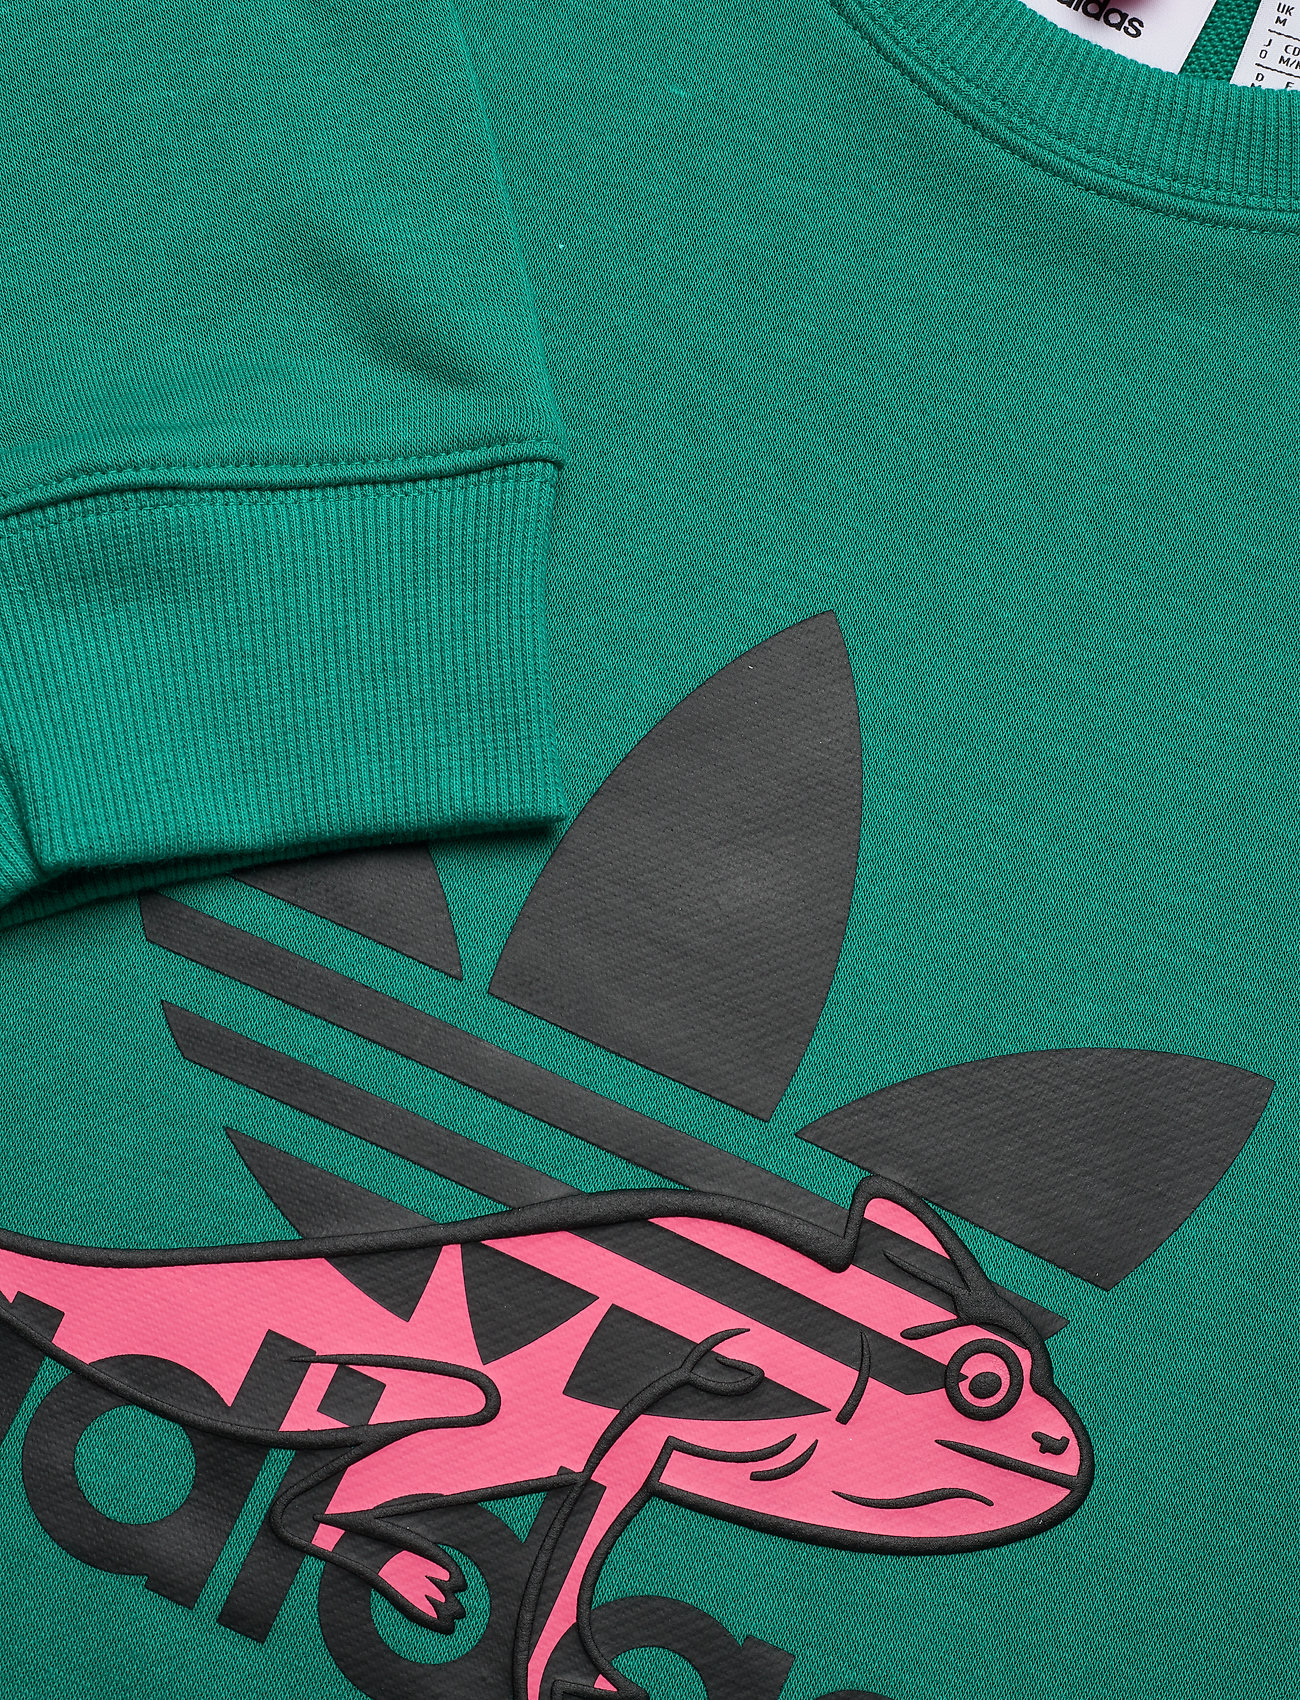 adidas Originals SWEATSHIRT - Sweatshirts GLRGRN - Menn Klær